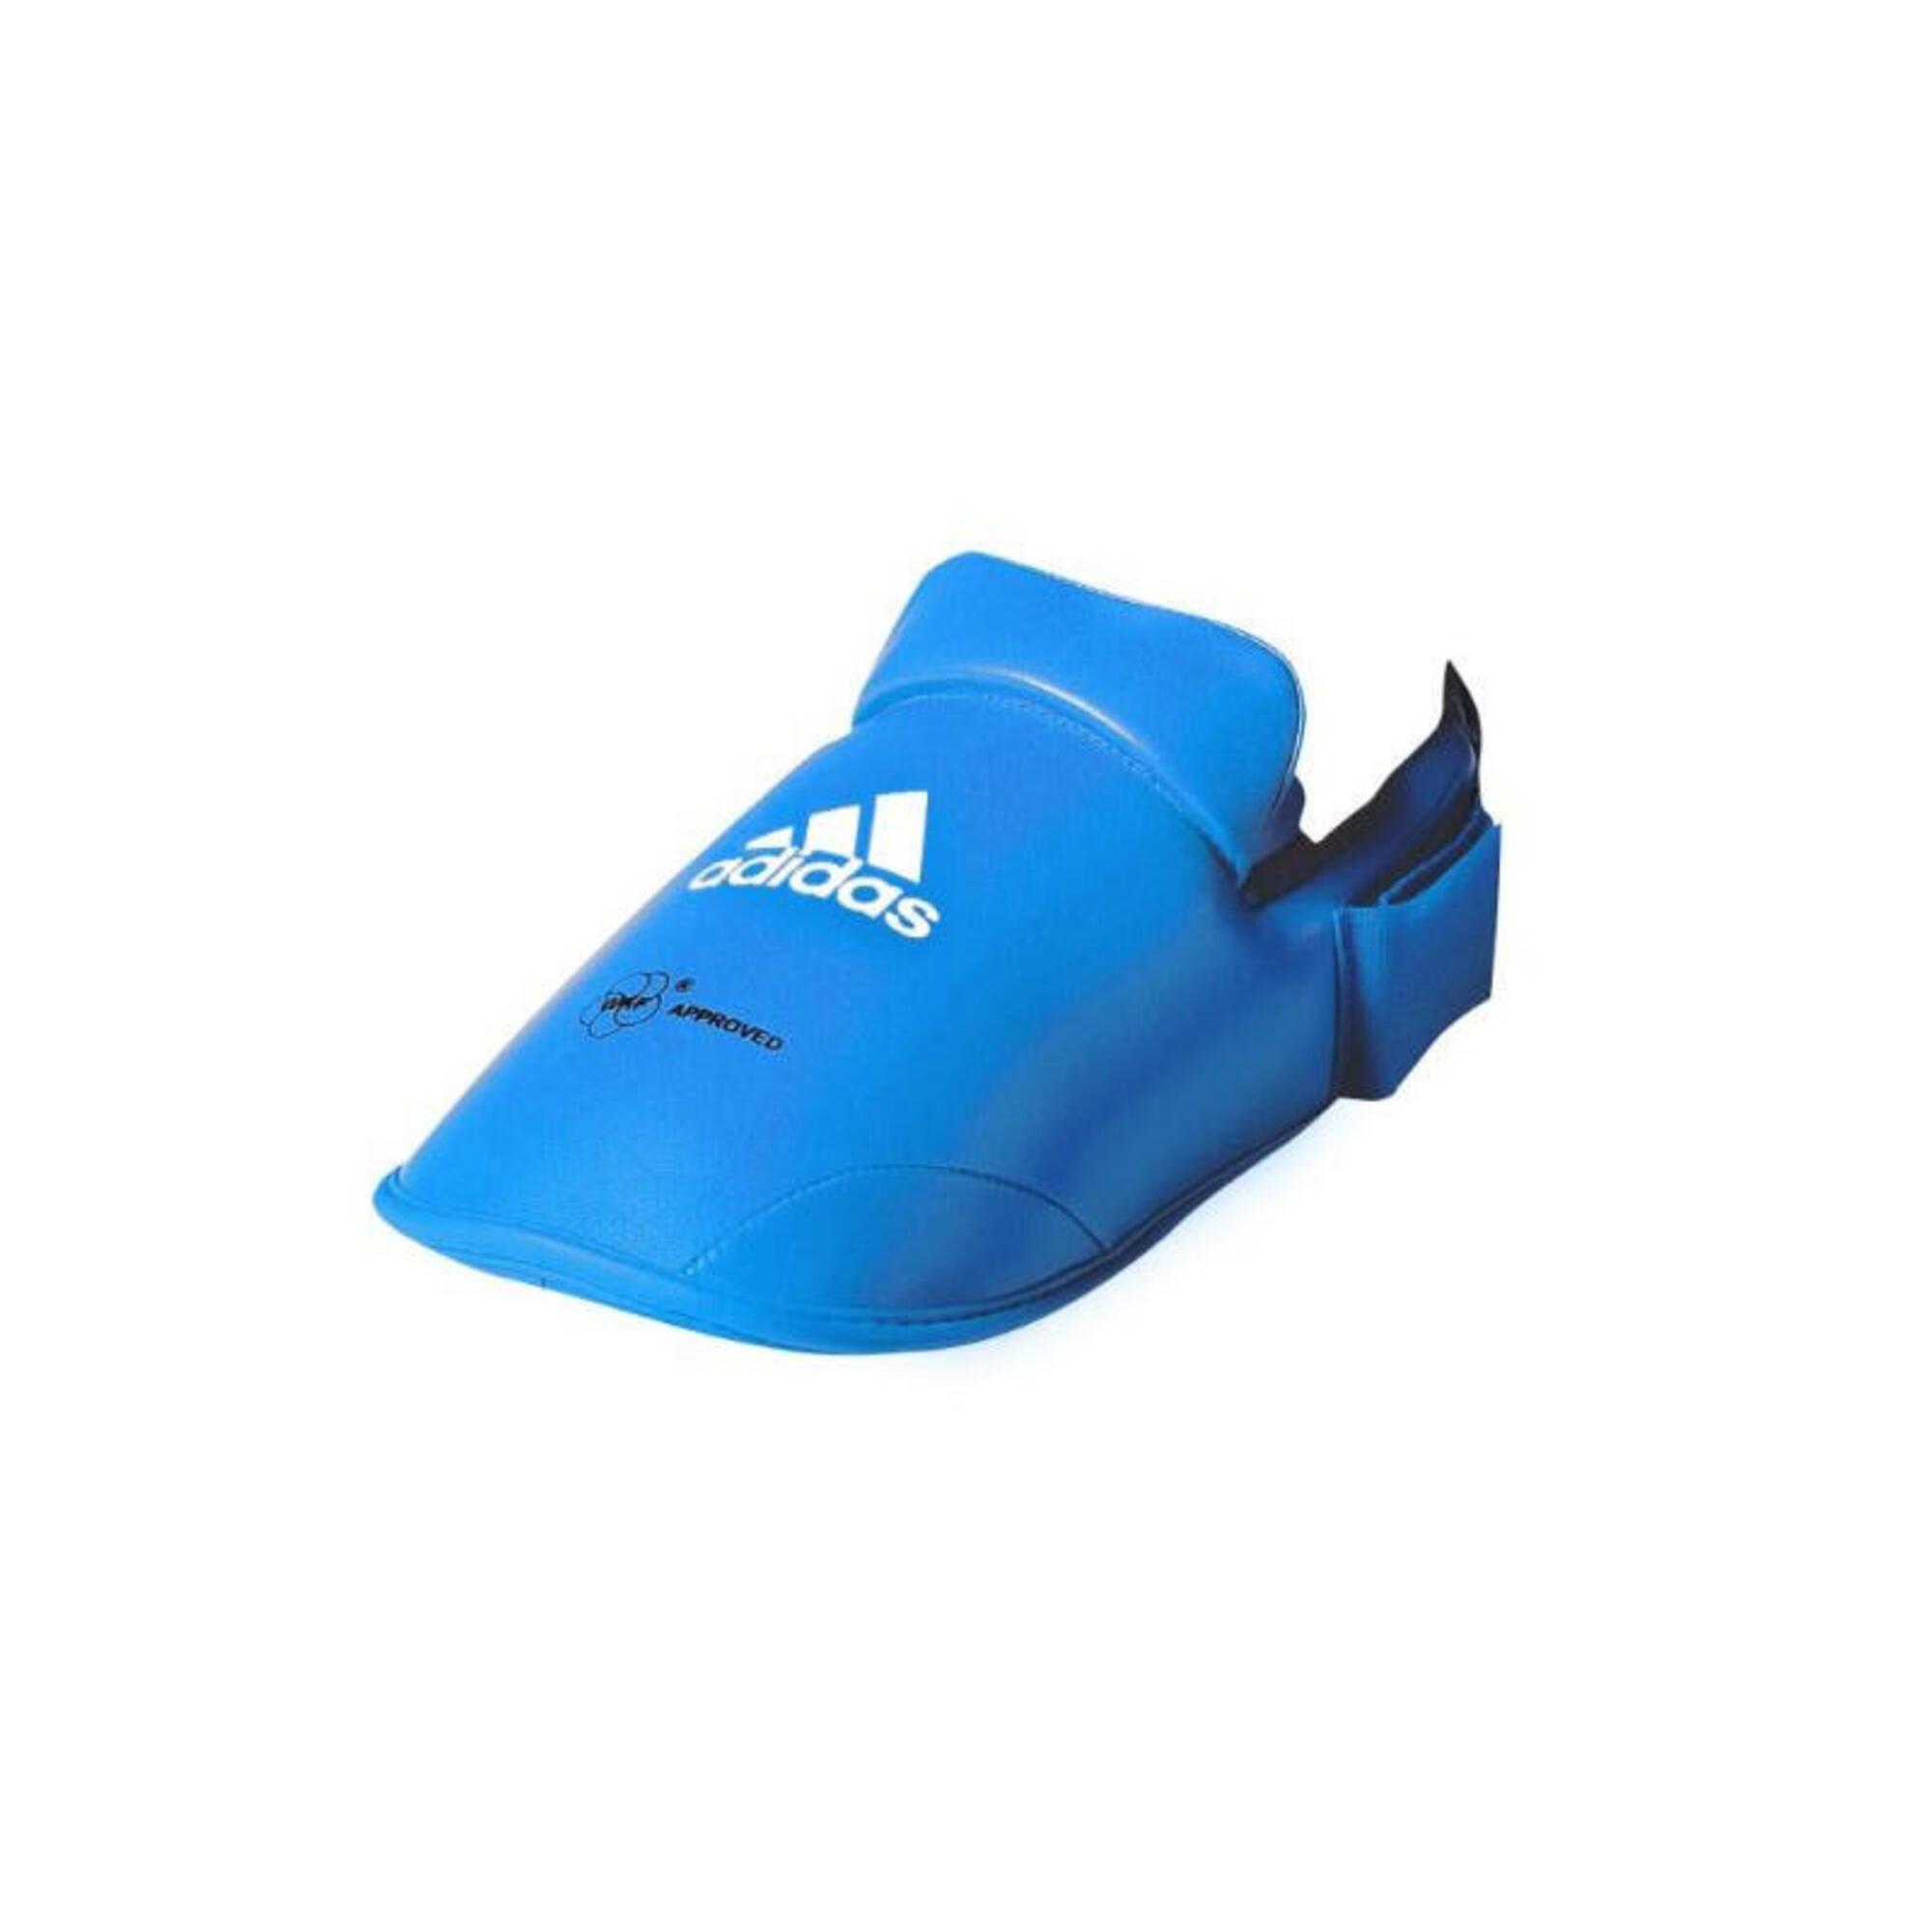 Protège pied karaté ADIDAS WKF rouge ou bleu